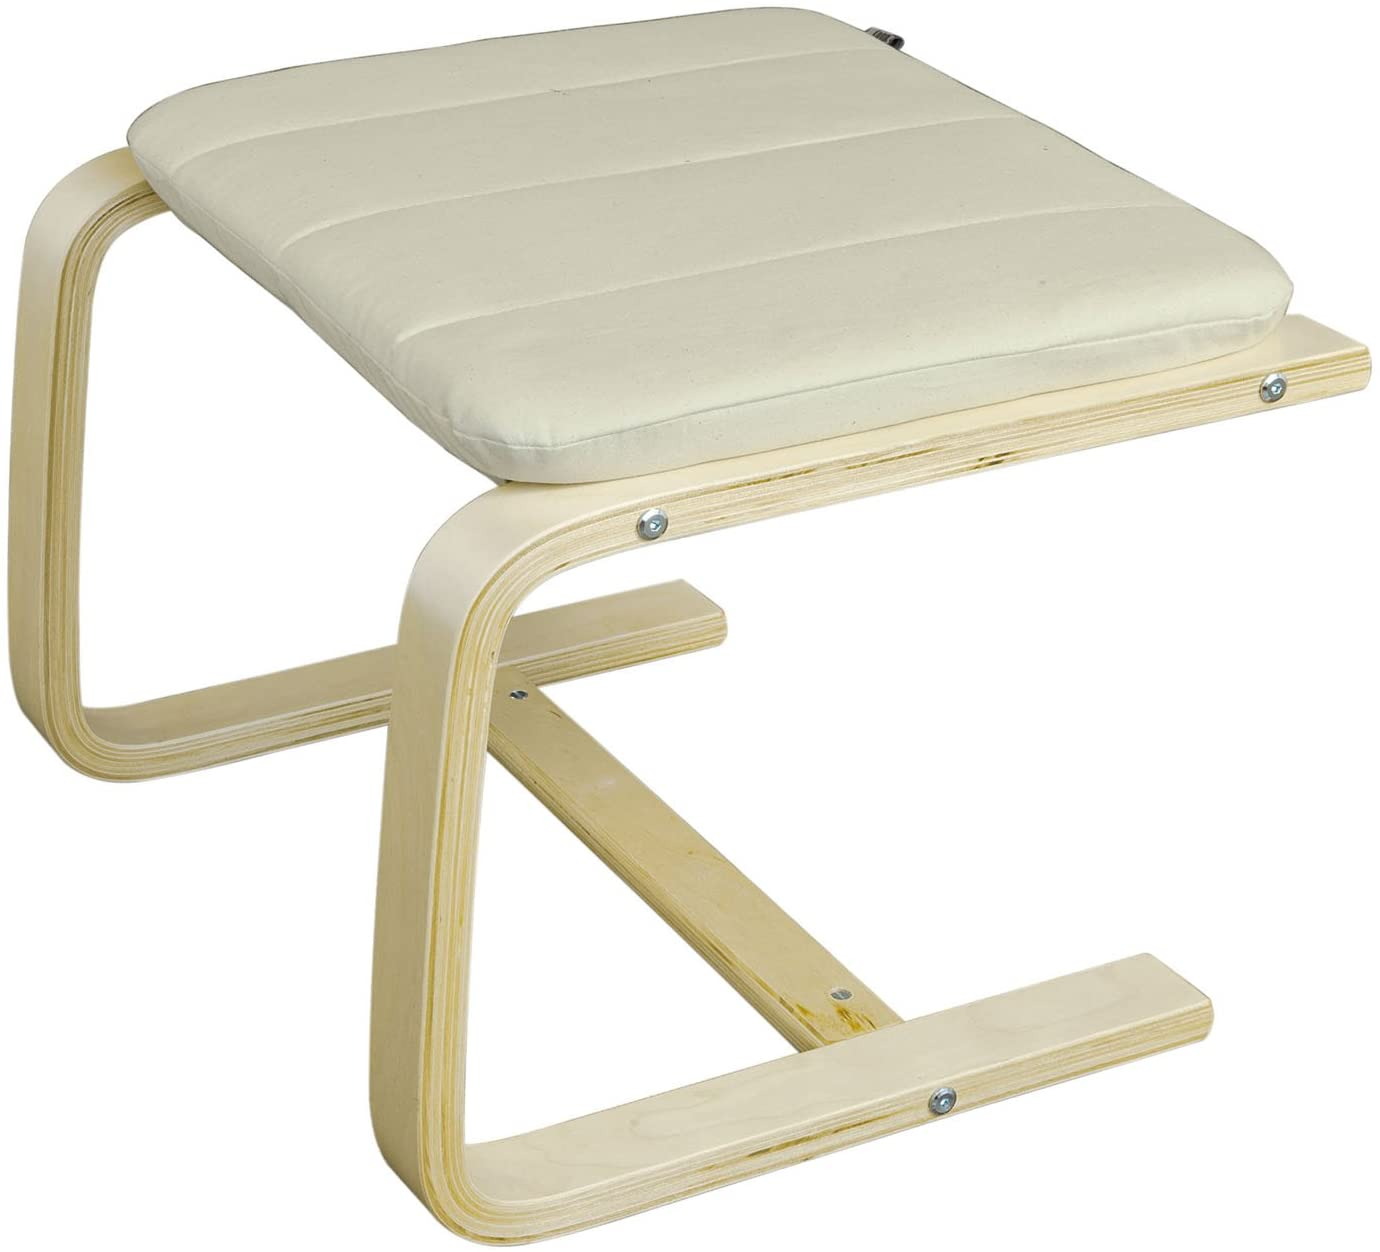 Full Size of Ikea Relaxsessel Sessel Elektrisch Gebraucht Mit Hocker Kinder Grau Leder Muren Strandmon Garten Modulküche Sofa Schlaffunktion Küche Kosten Betten 160x200 Wohnzimmer Ikea Relaxsessel